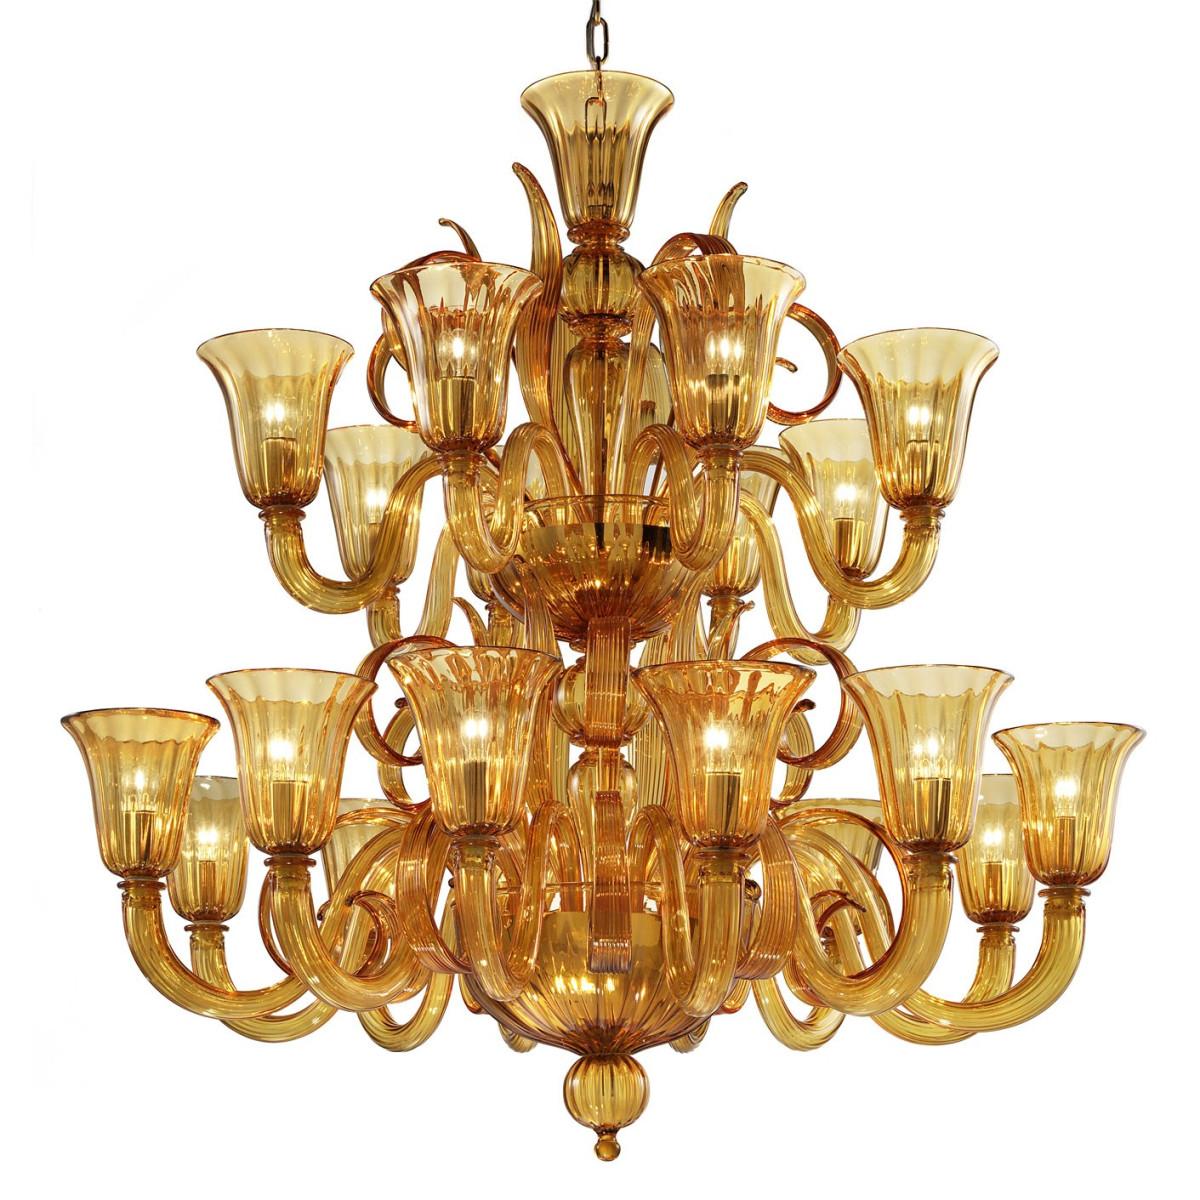 """Diogene"" Murano glass chandelier - 20 lights - amber"